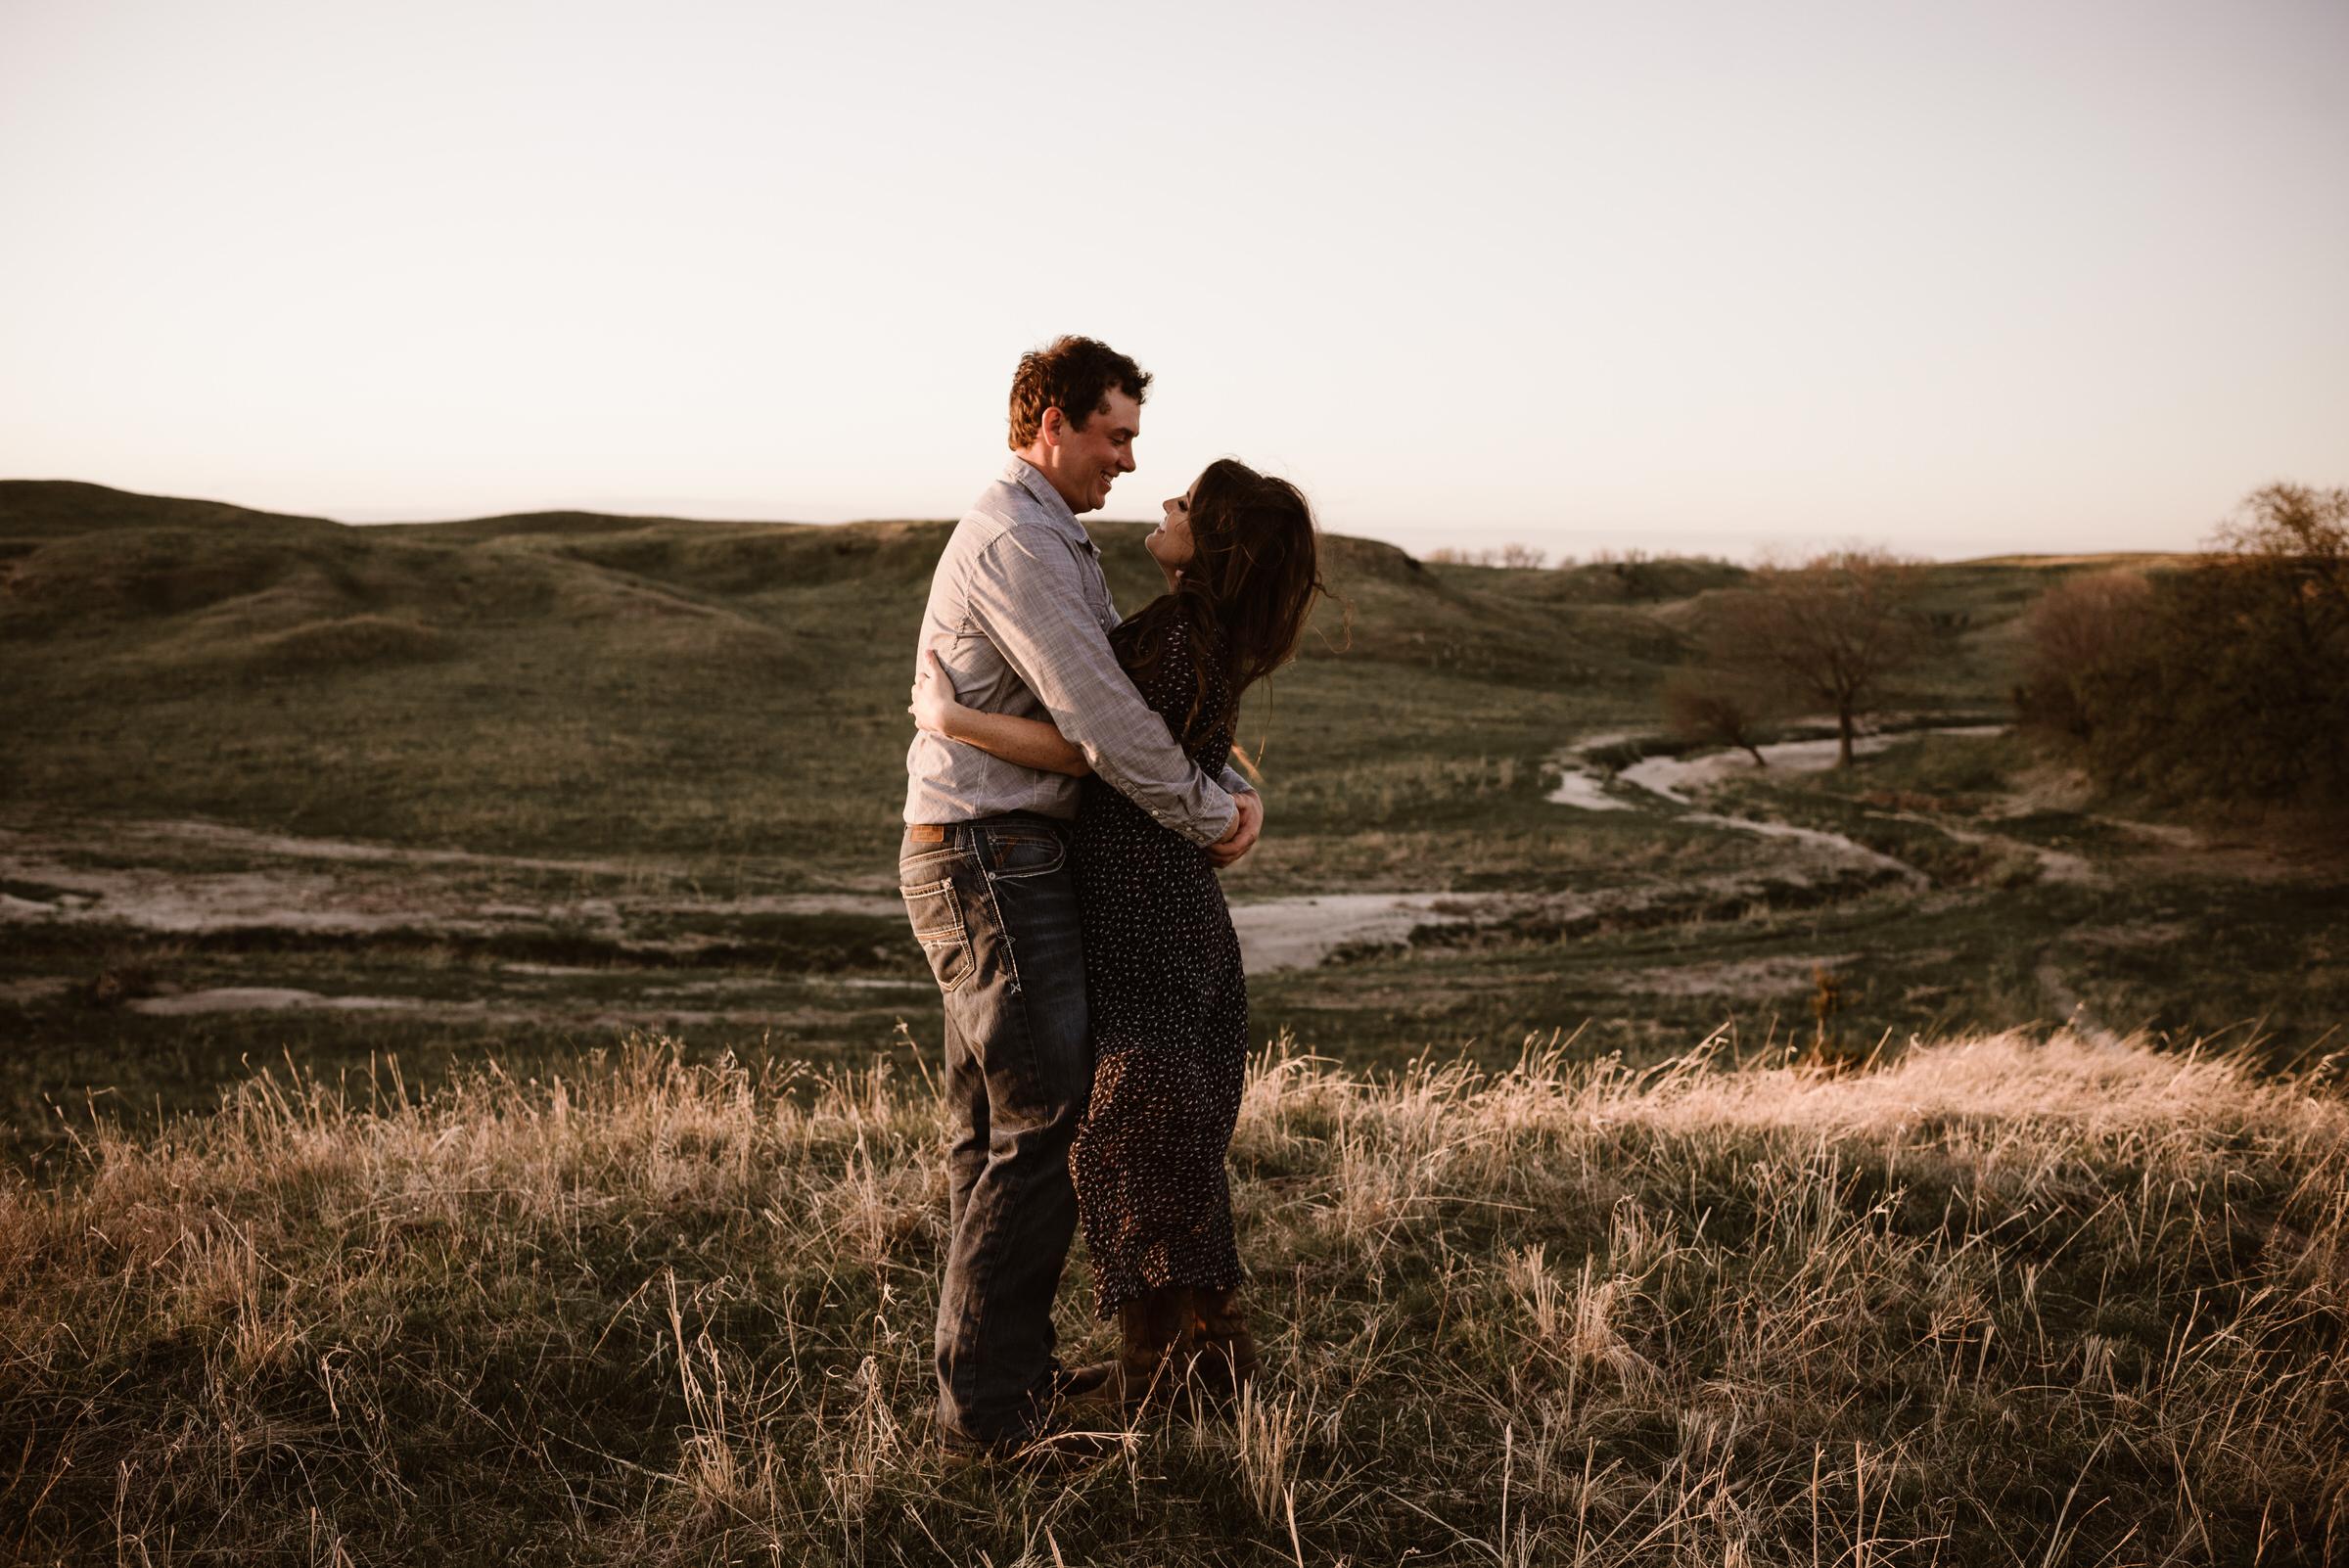 Sandhills-Nebraska-Engagement-Wedding-Photographer-Kaylie-Sirek-Photography-030.jpg